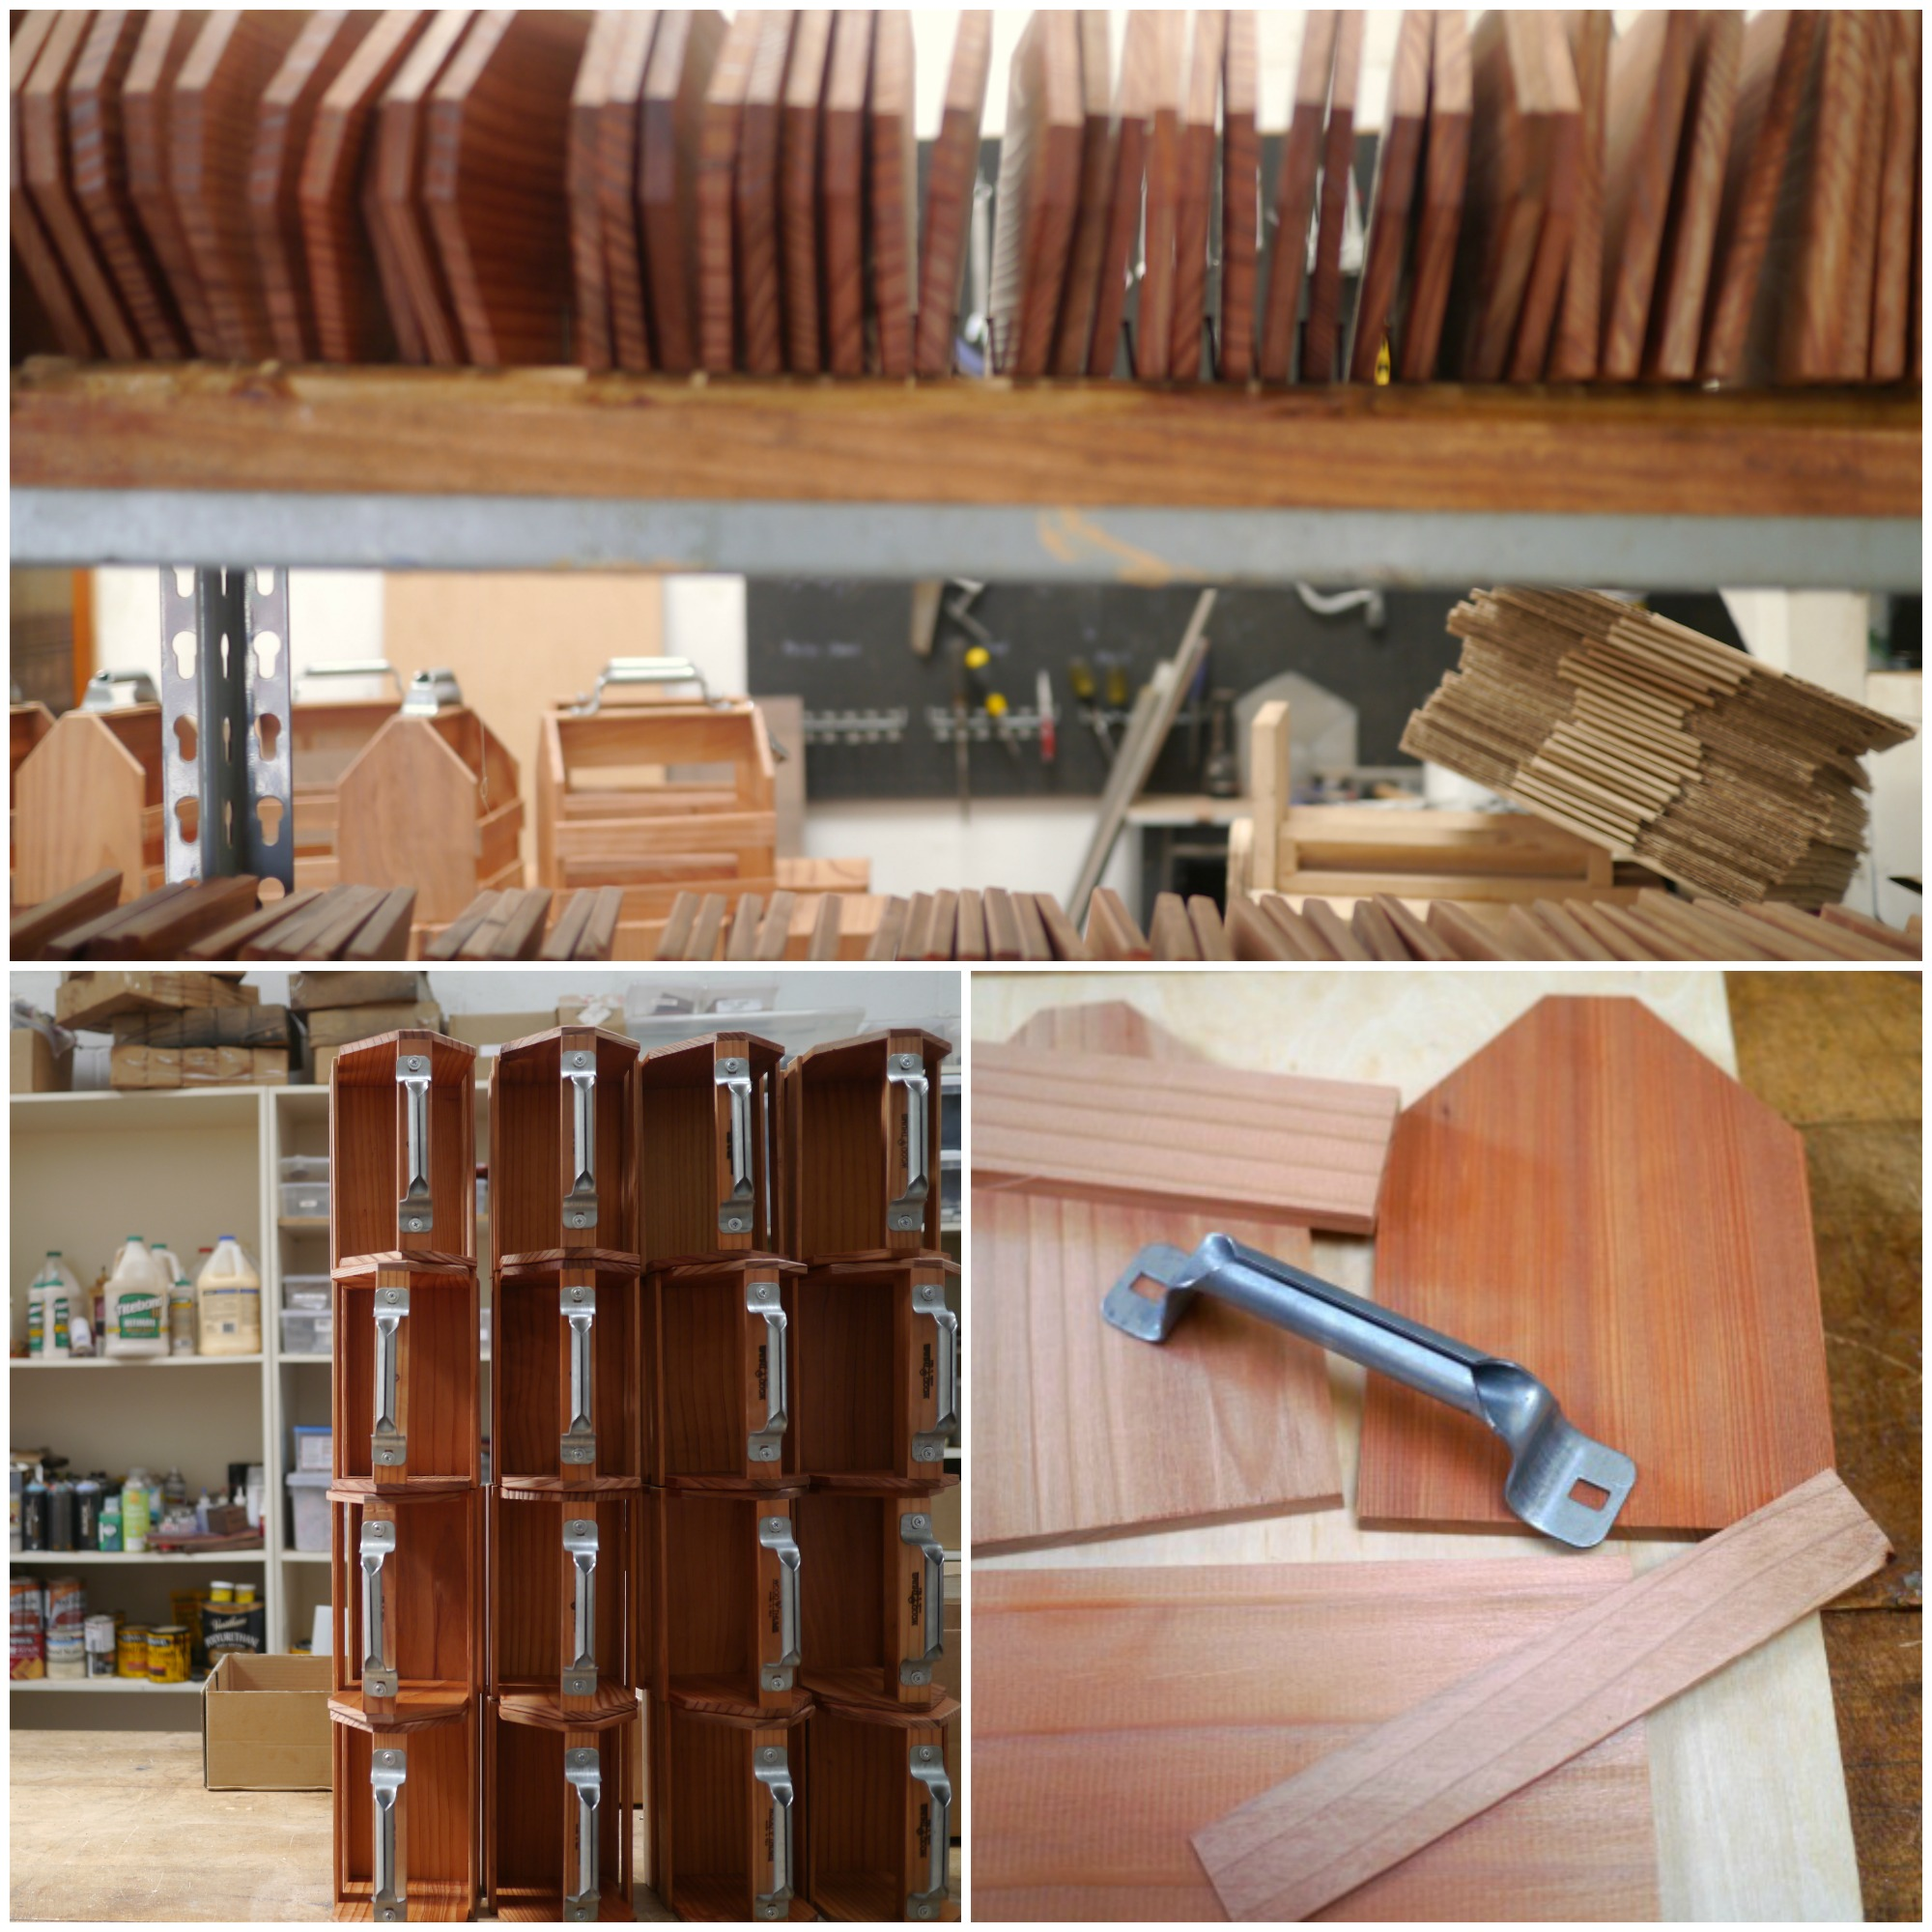 Wooden Beer Caddies from Woodthumb | UncommonGoods